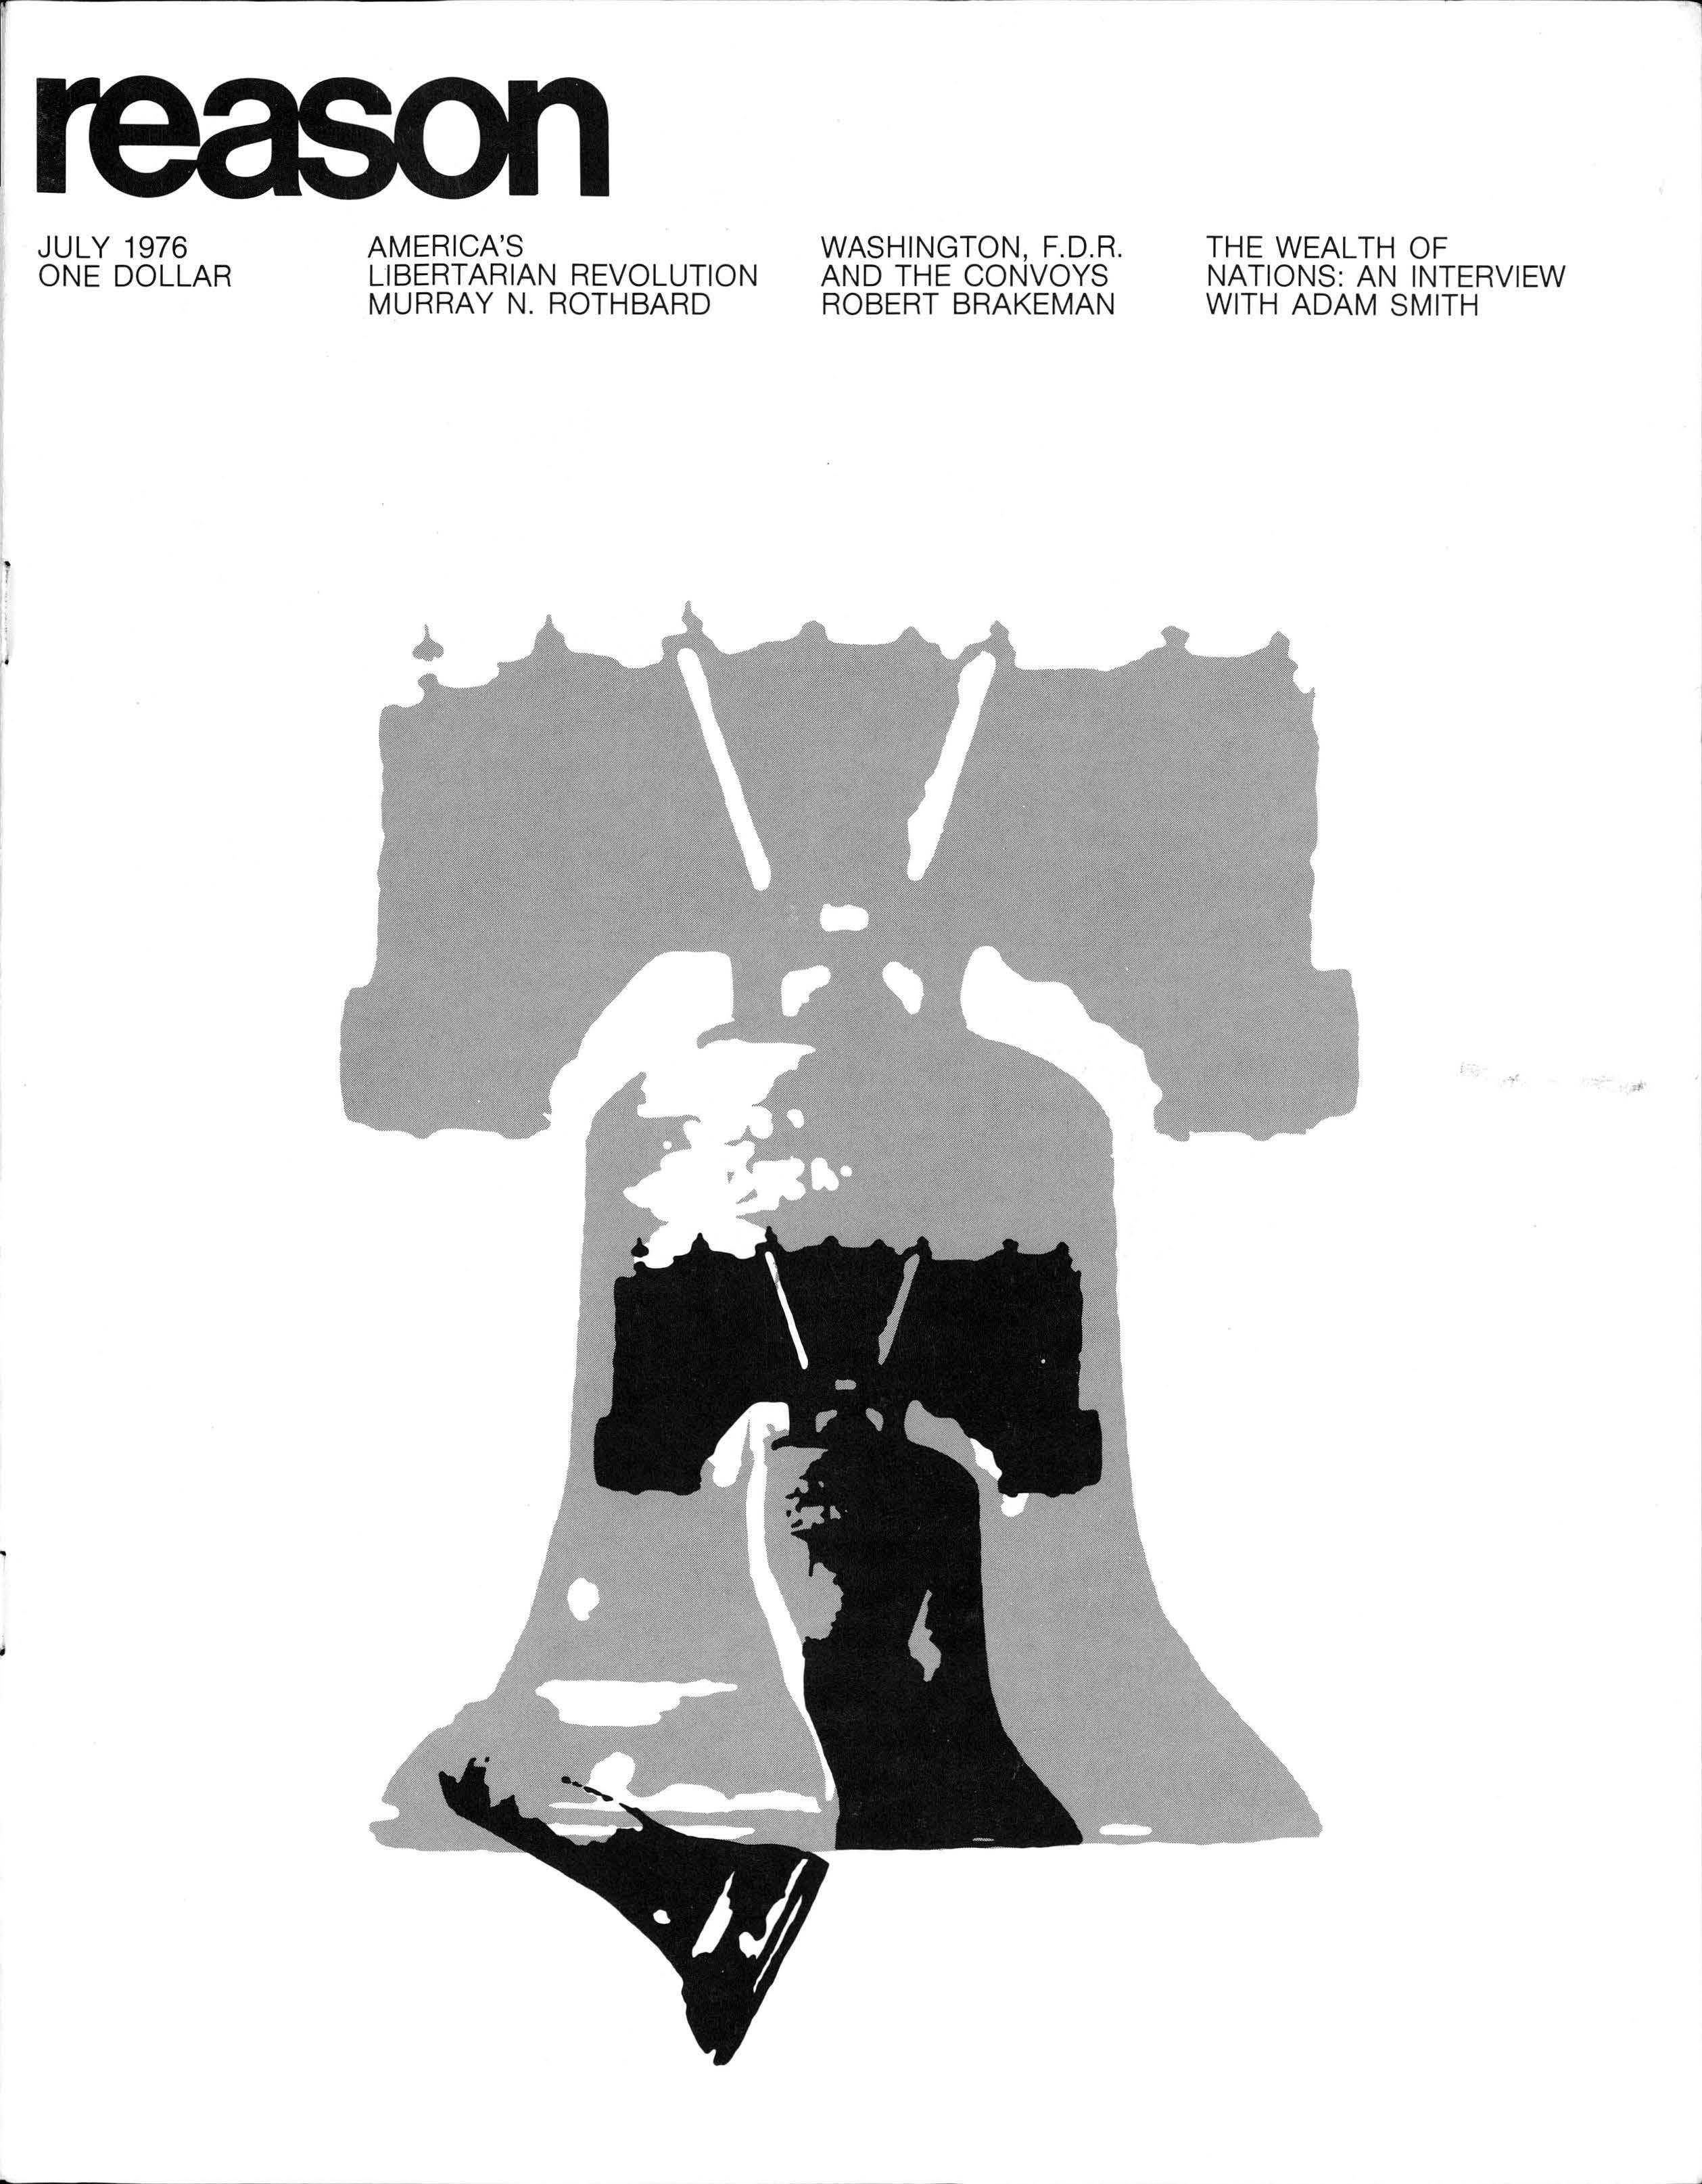 Reason Magazine, July 1976 cover image